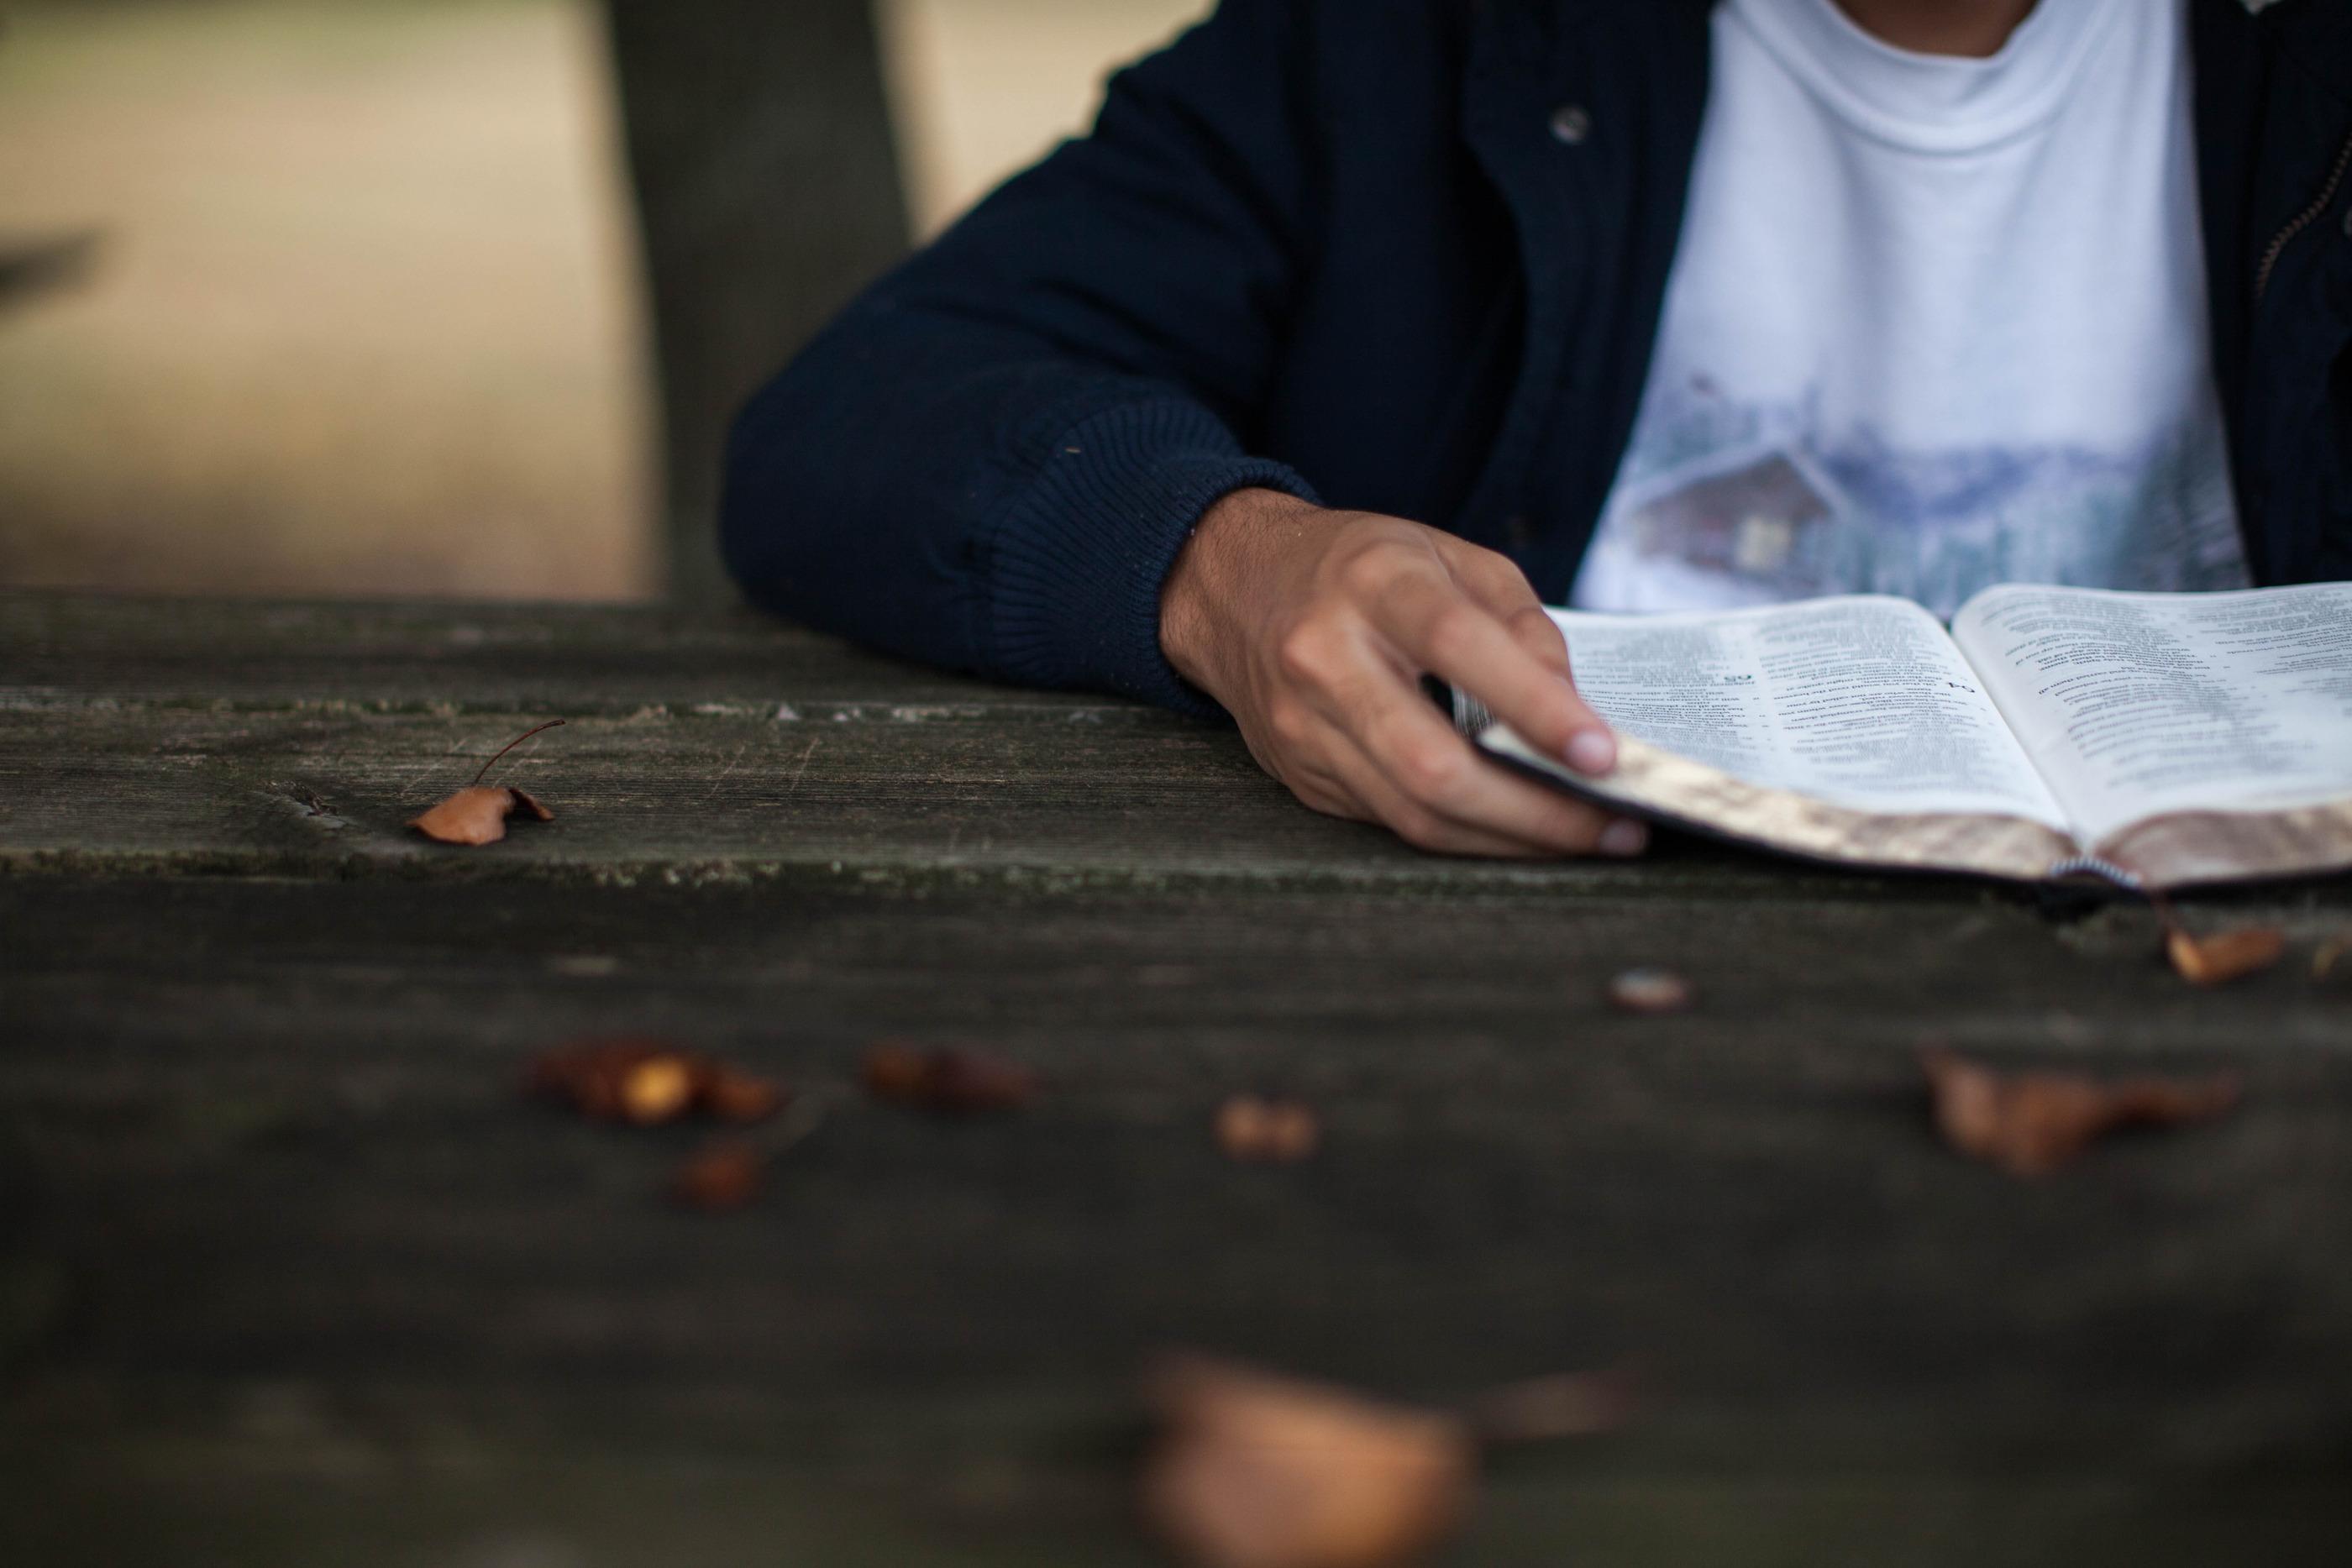 Youth Pastors